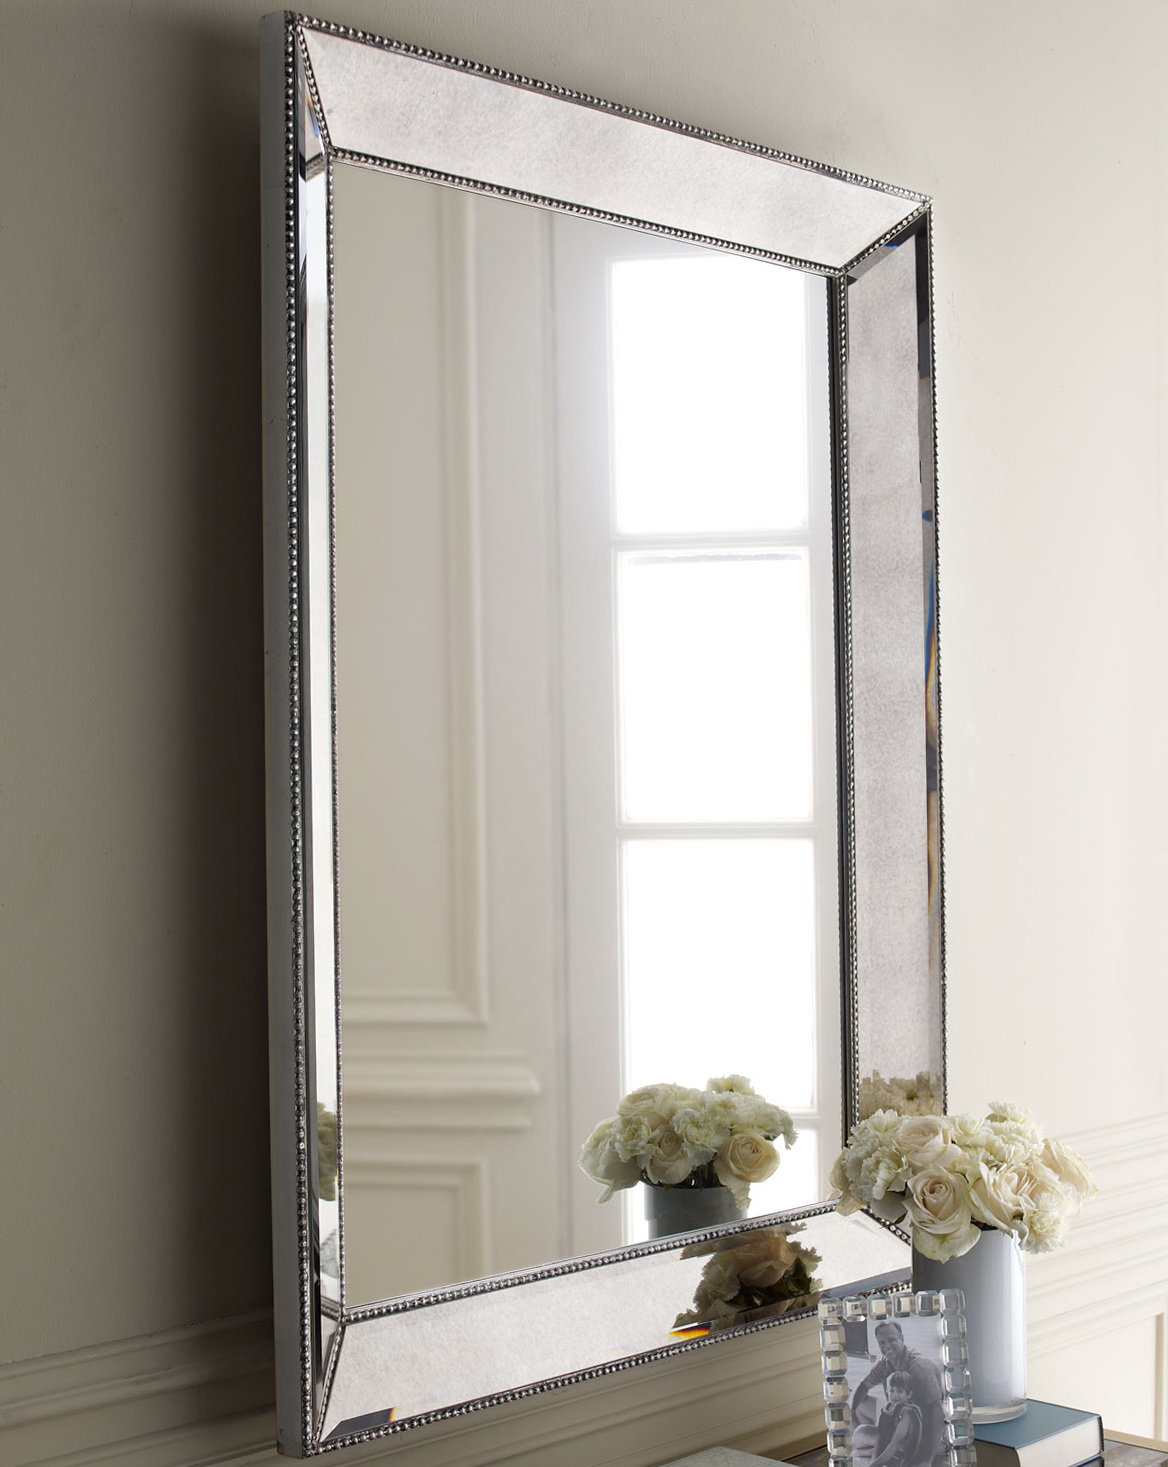 Modern Wall Mirrors Uk  Home Design Ideas